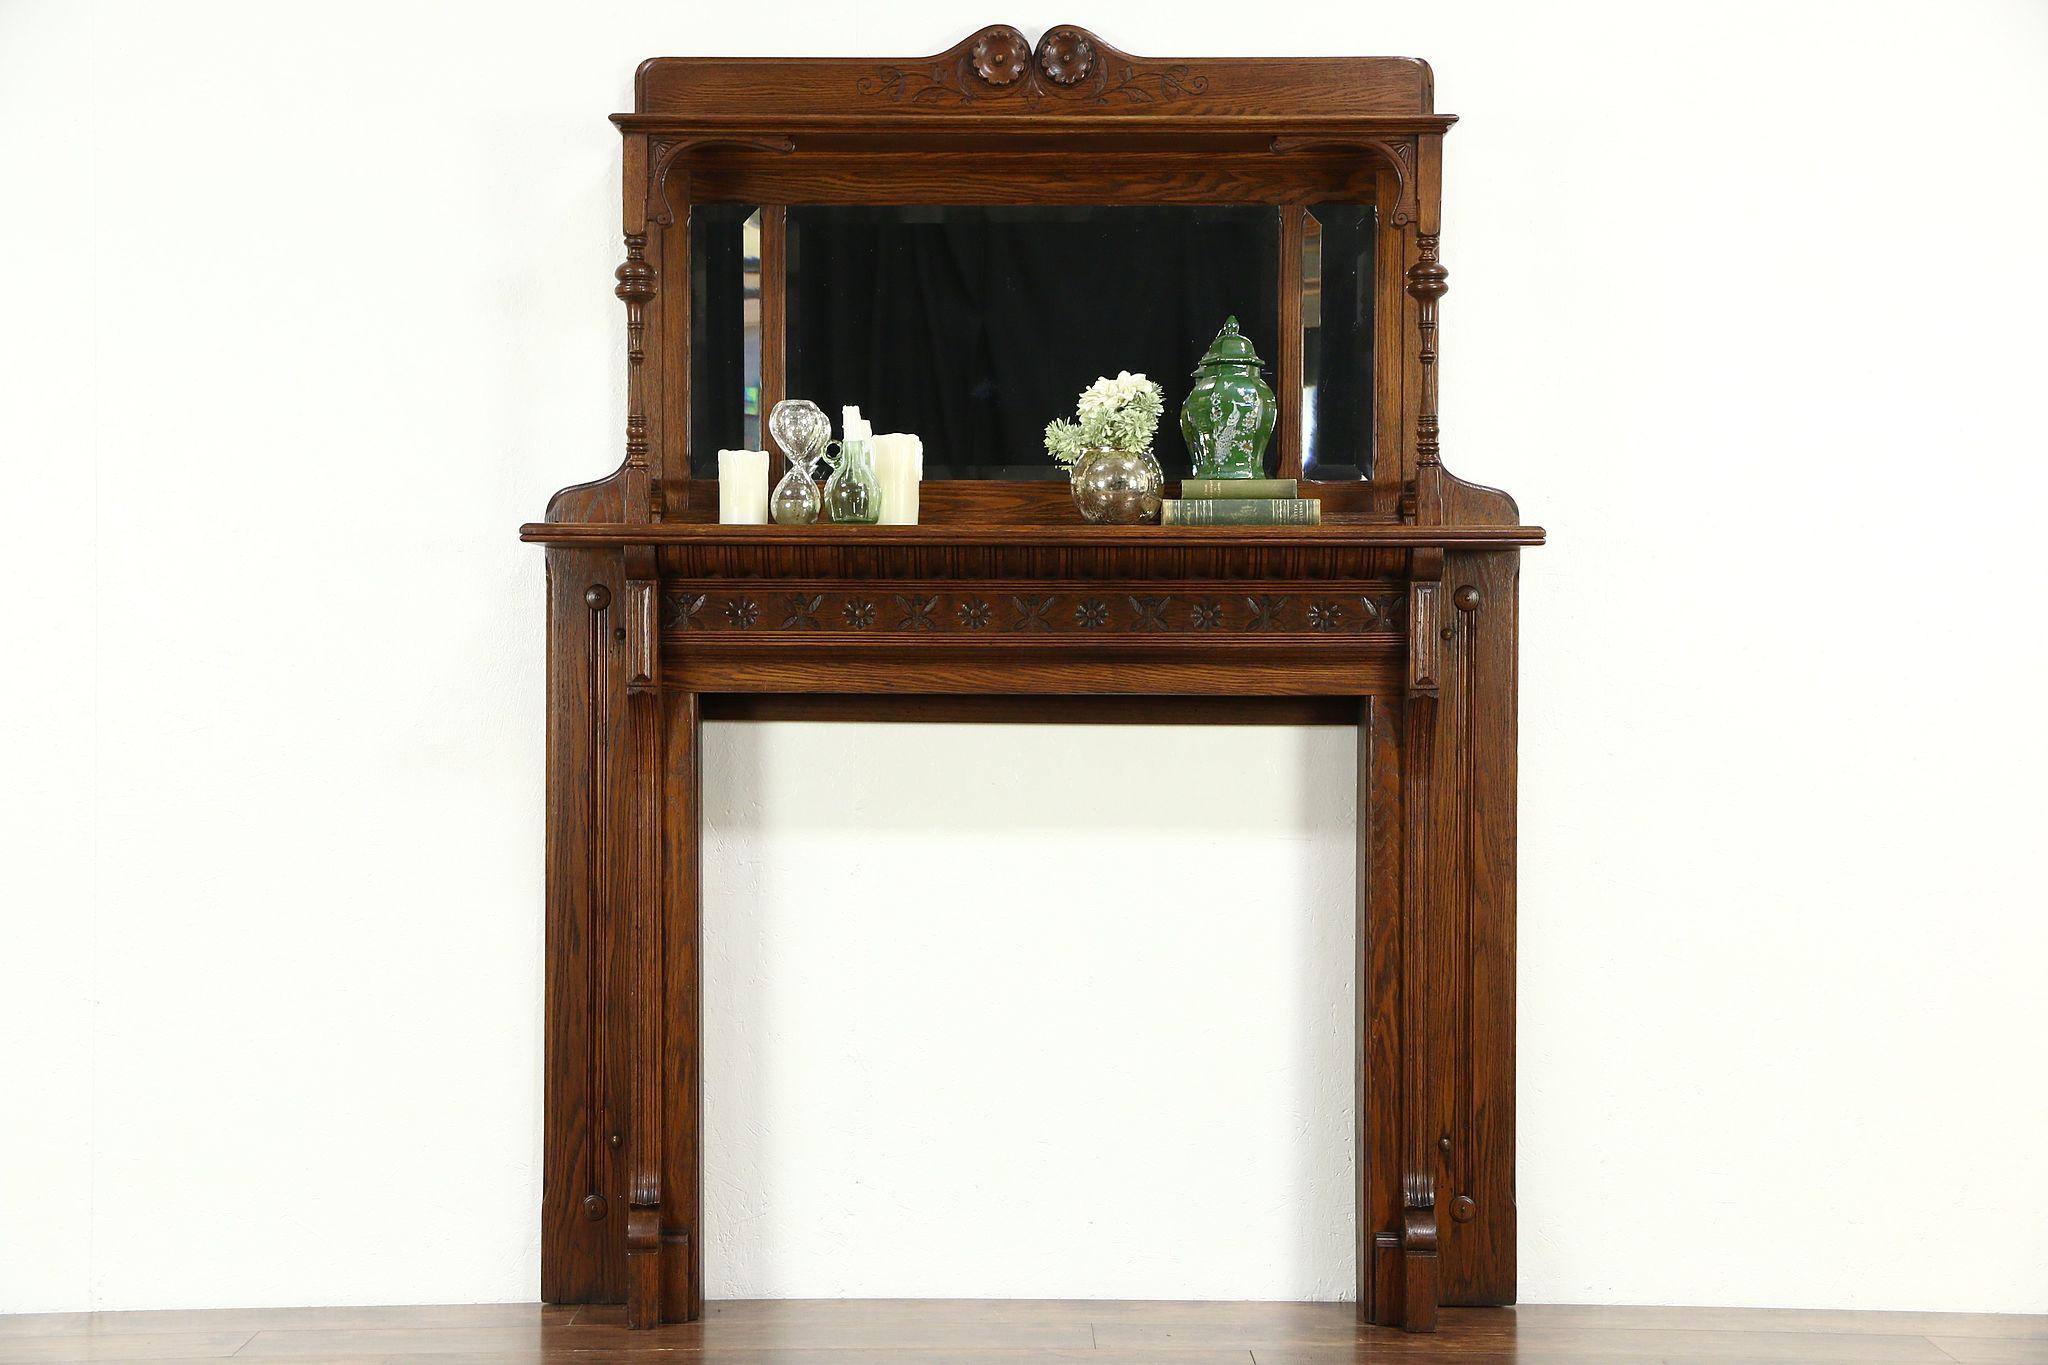 Victorian Eastlake Oak Antique Architectural Salvage Fireplace Mantel Mirrors